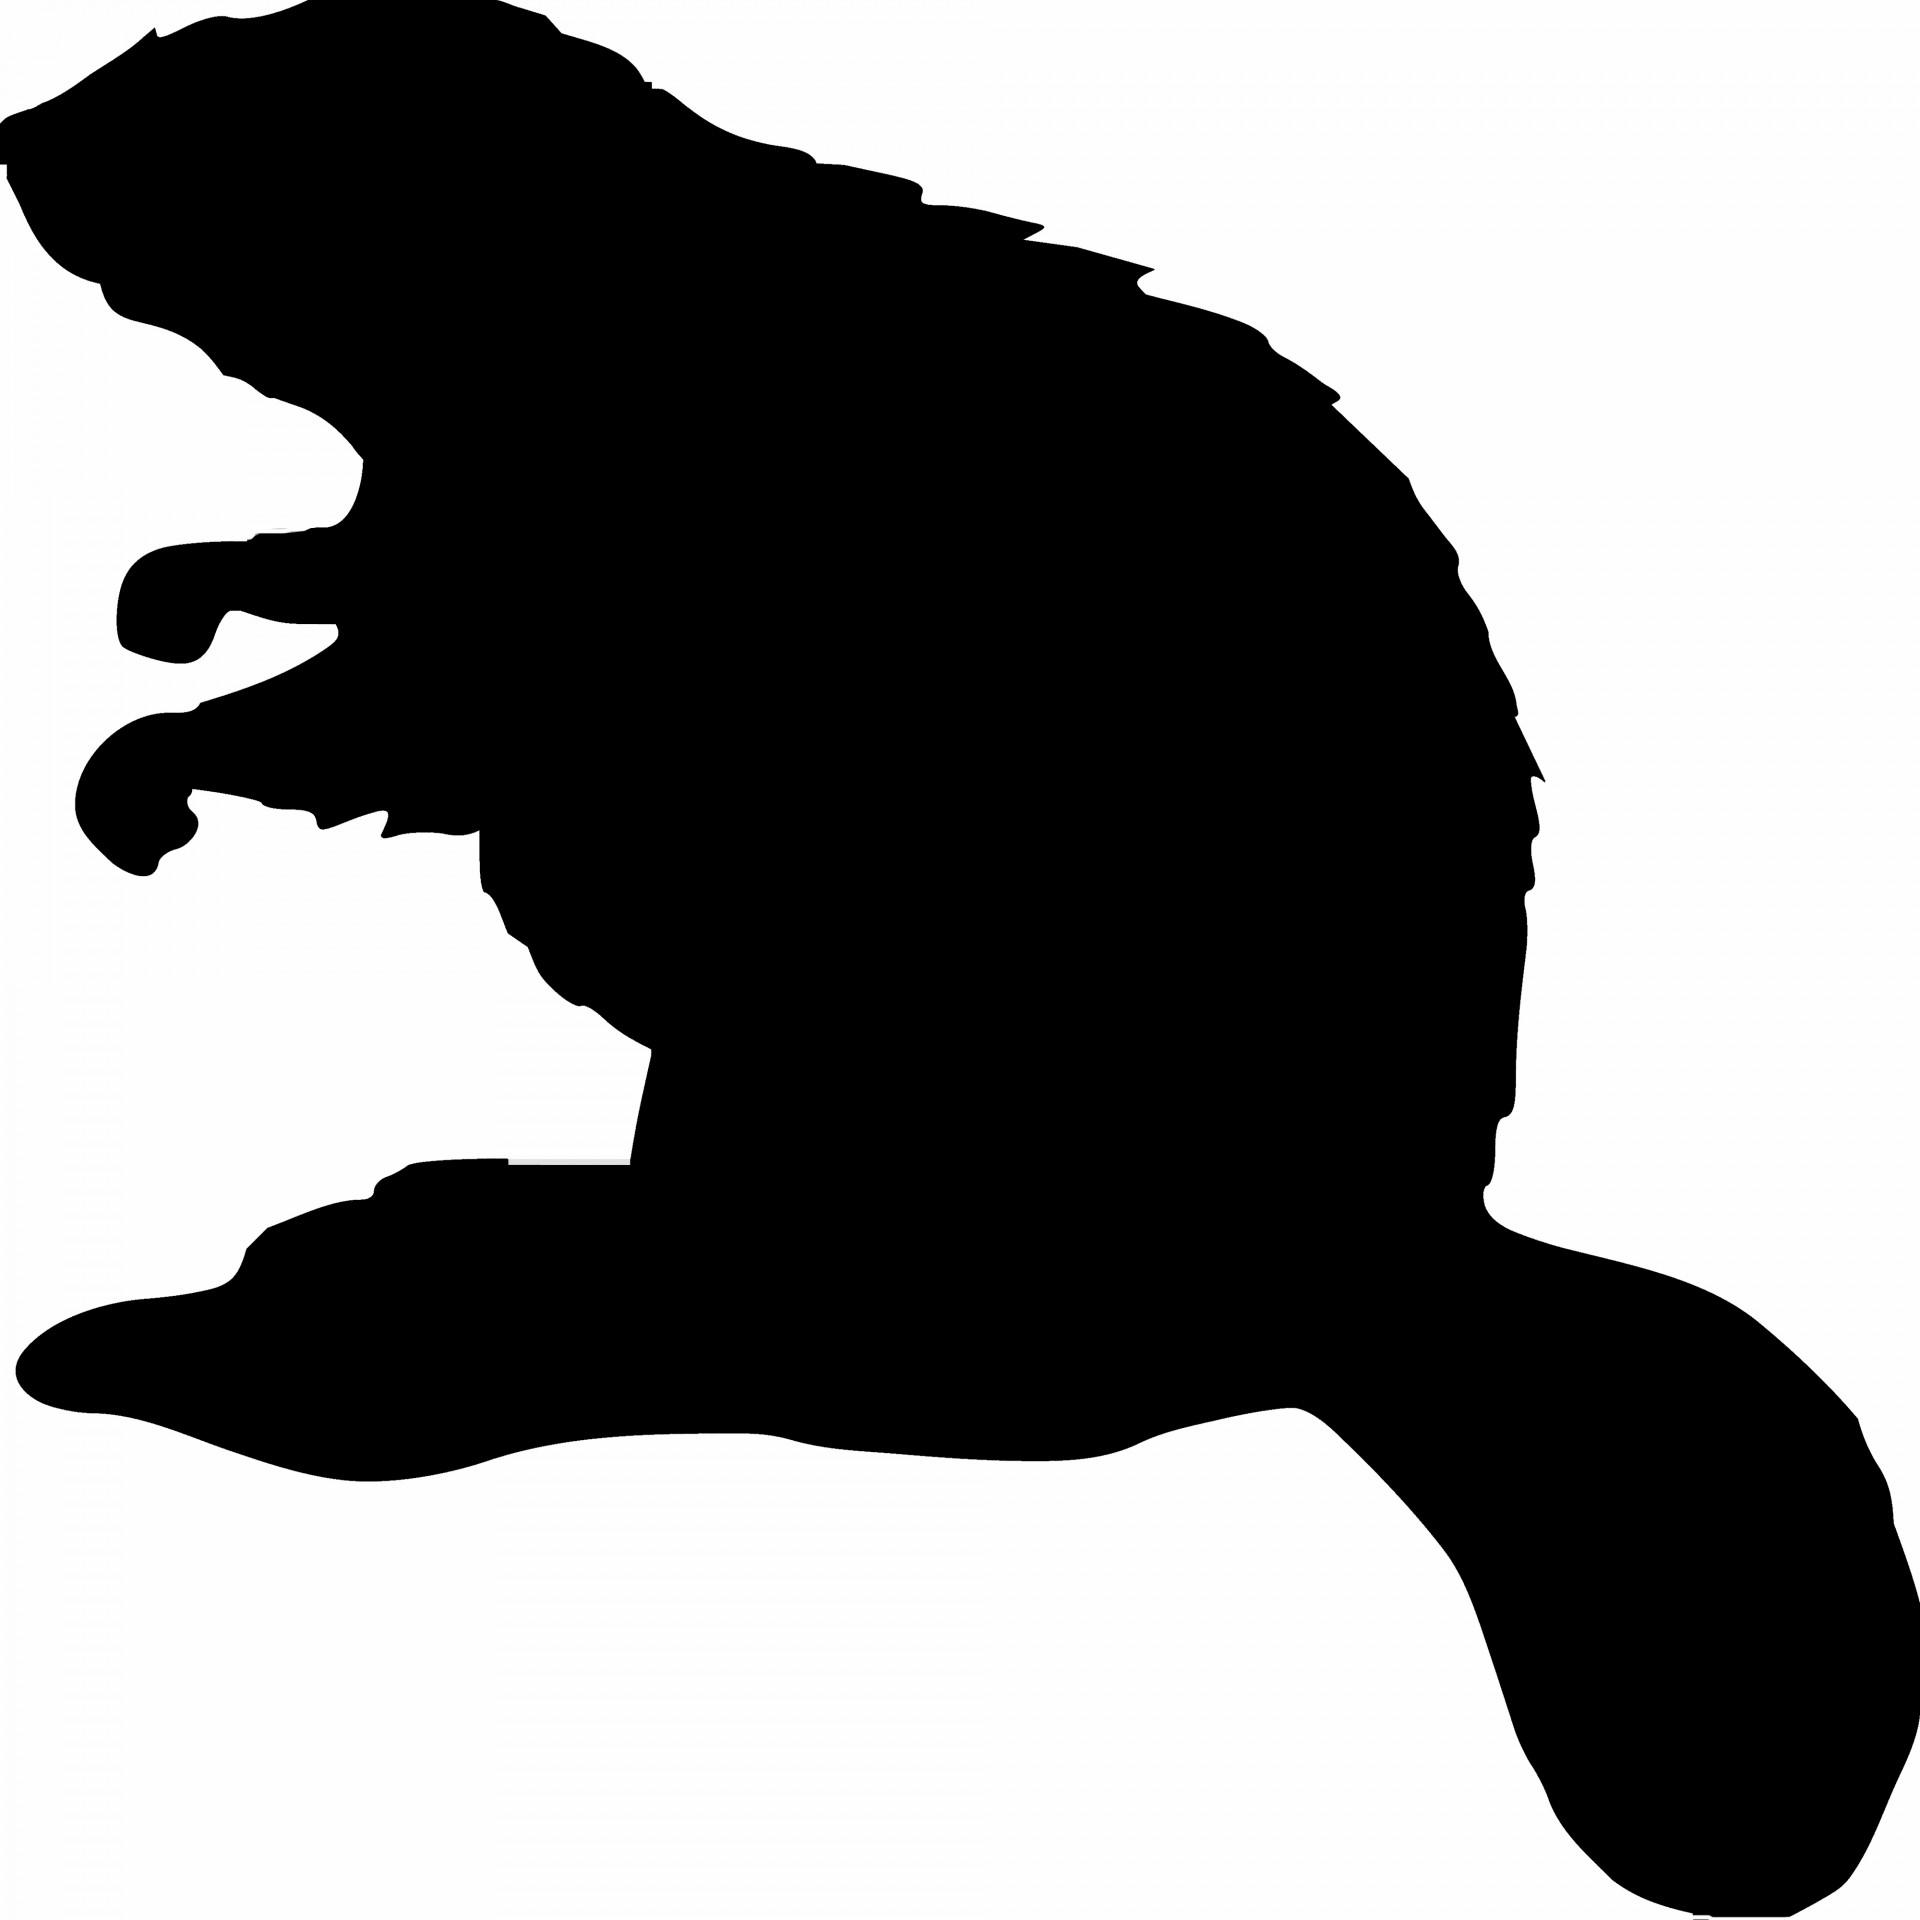 Beaver silhouette free.